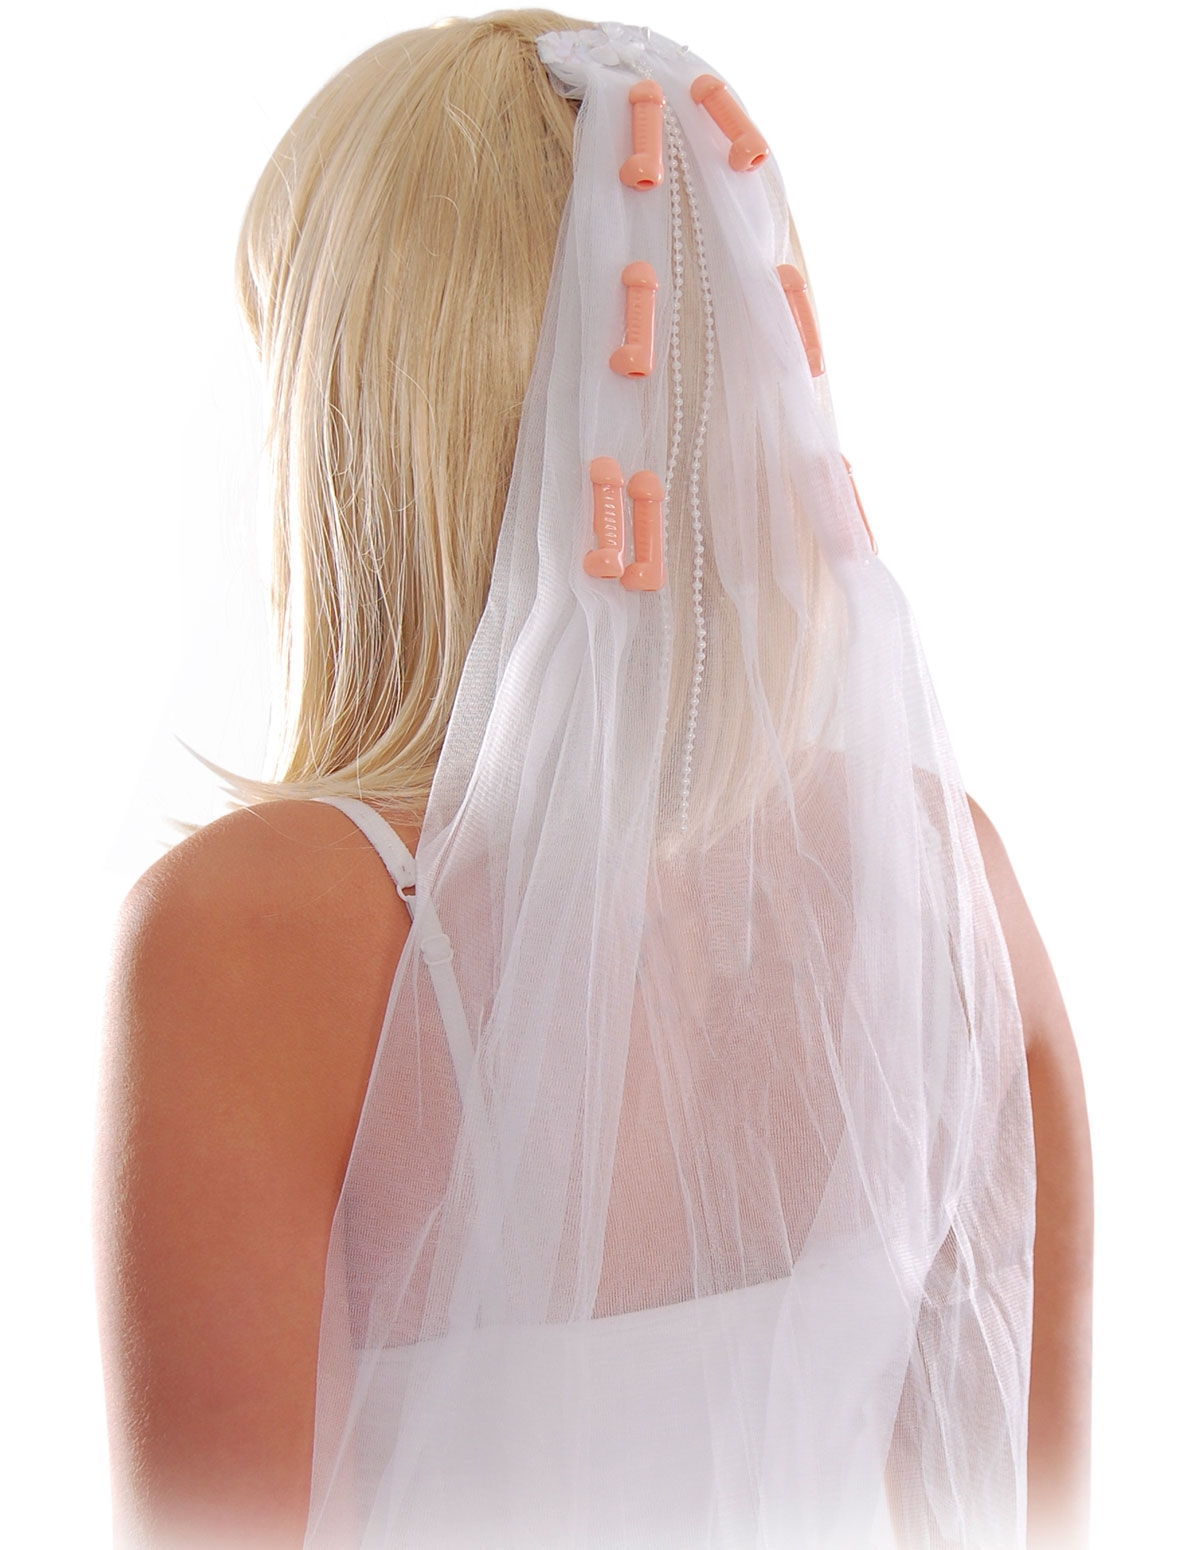 Bachelorette Pecker Veil